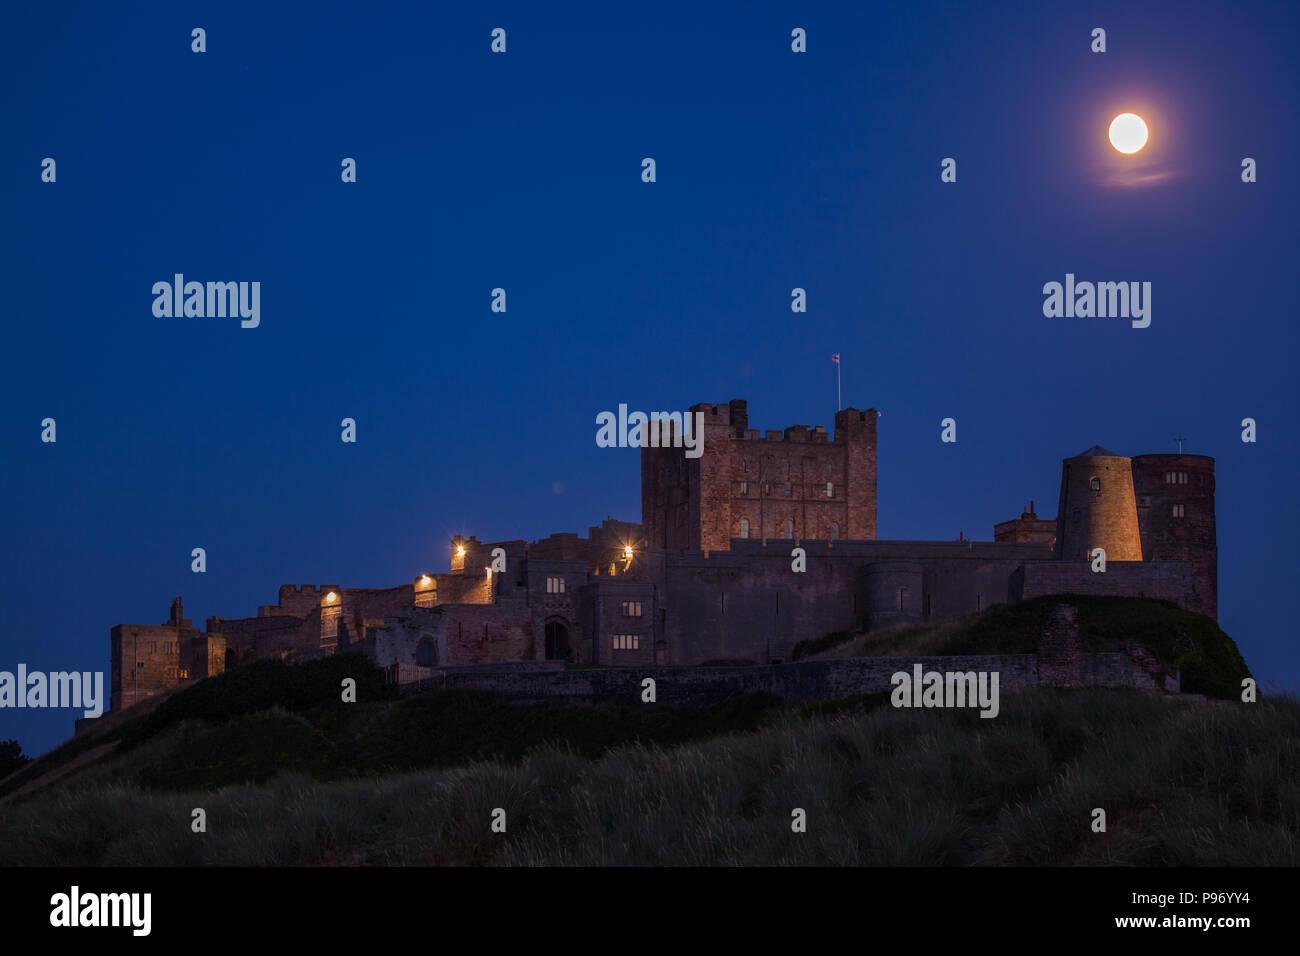 Abend am Bamburgh Castle mit Vollmond - Stock Image